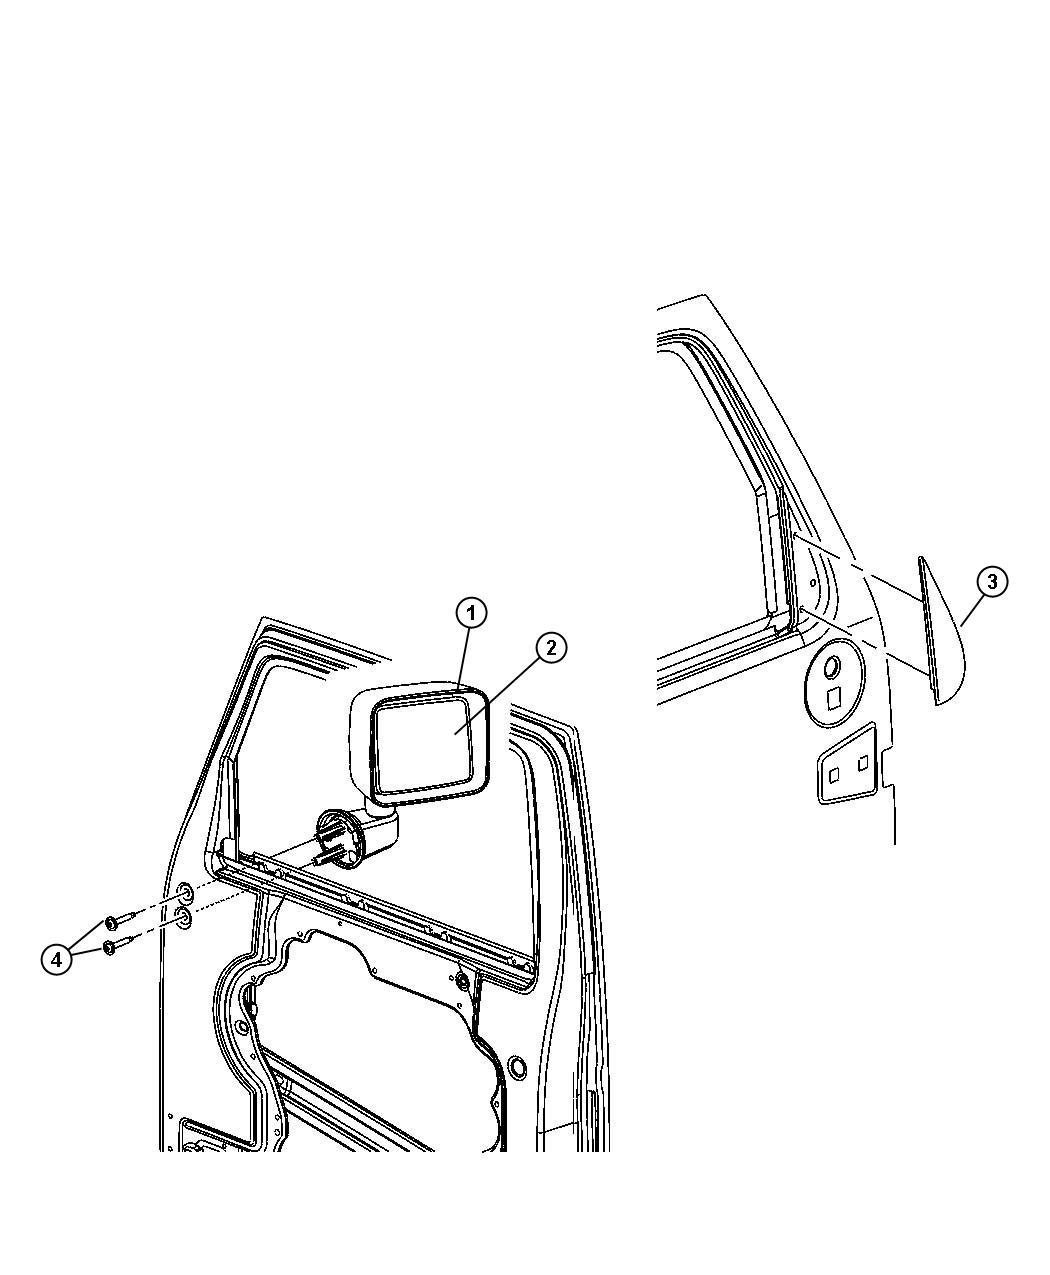 Jeep Wrangler Screw Hex Head M8x1 25x52 2 Per